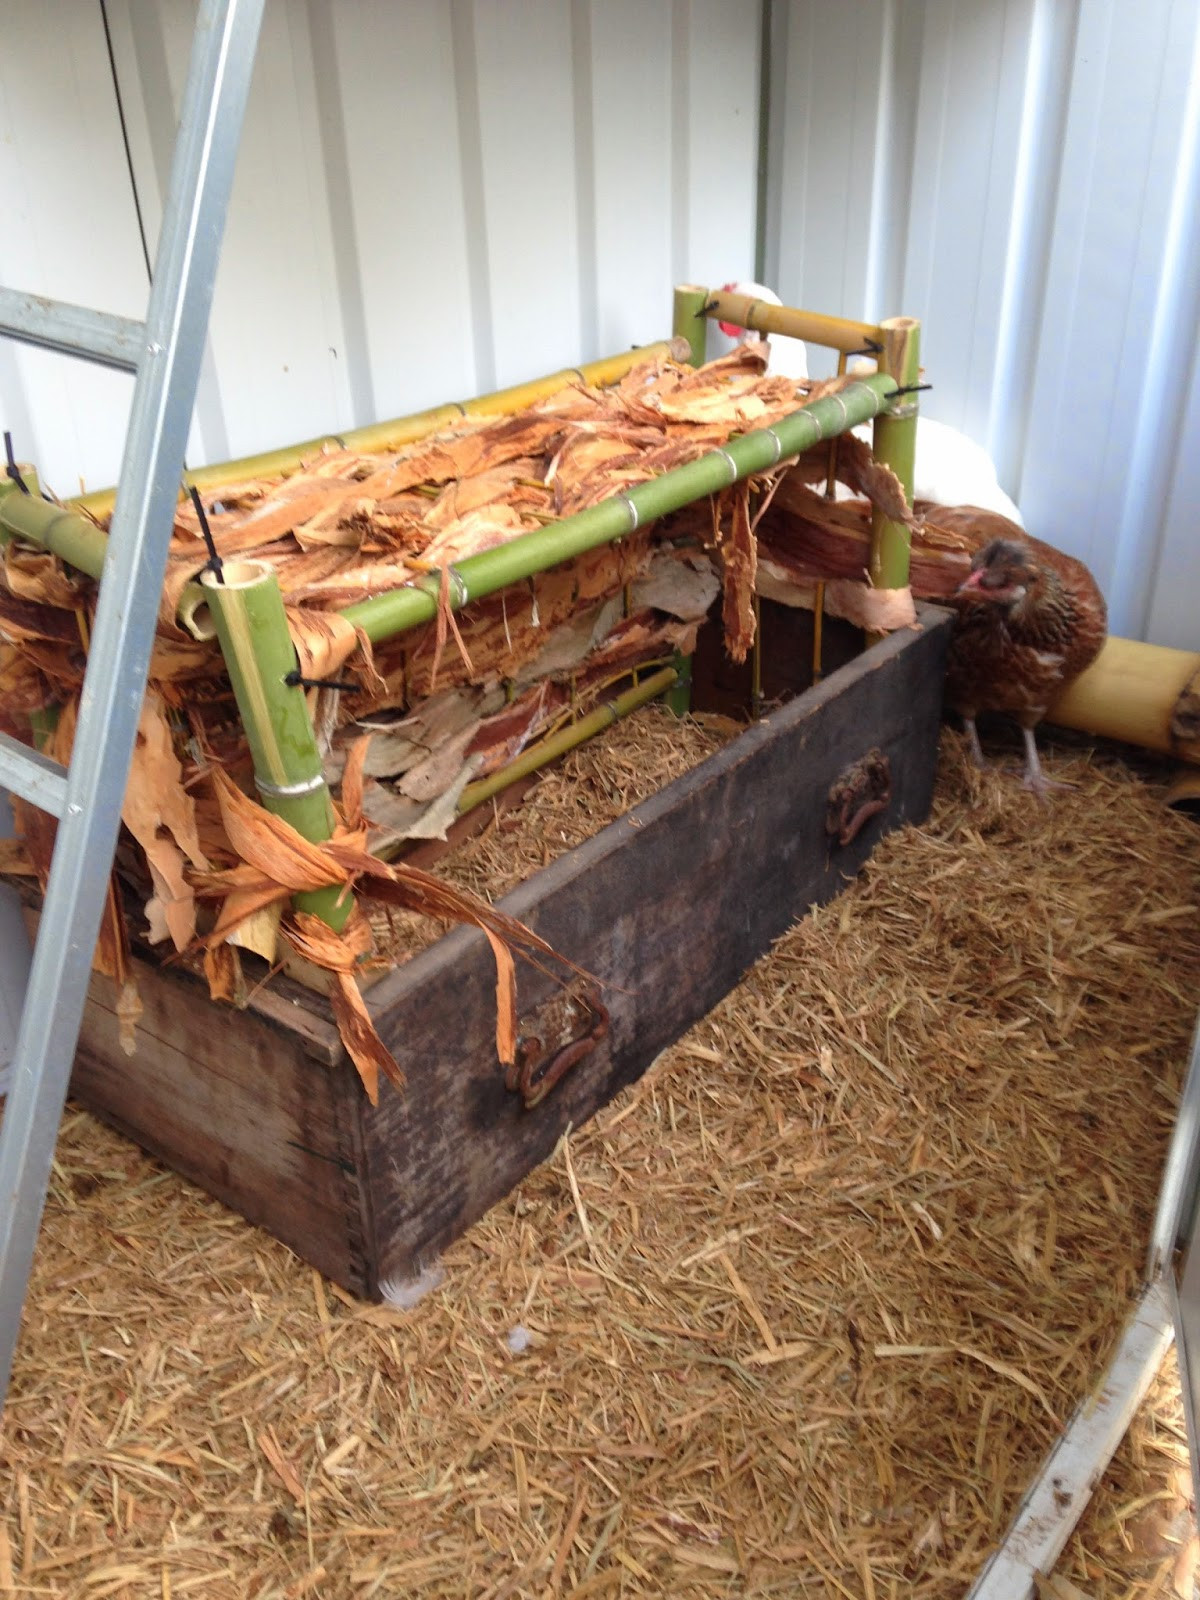 DIY Chicken Nest Box  This Small Town Life Backyard DIY Part 3 Chicken Nesting Box